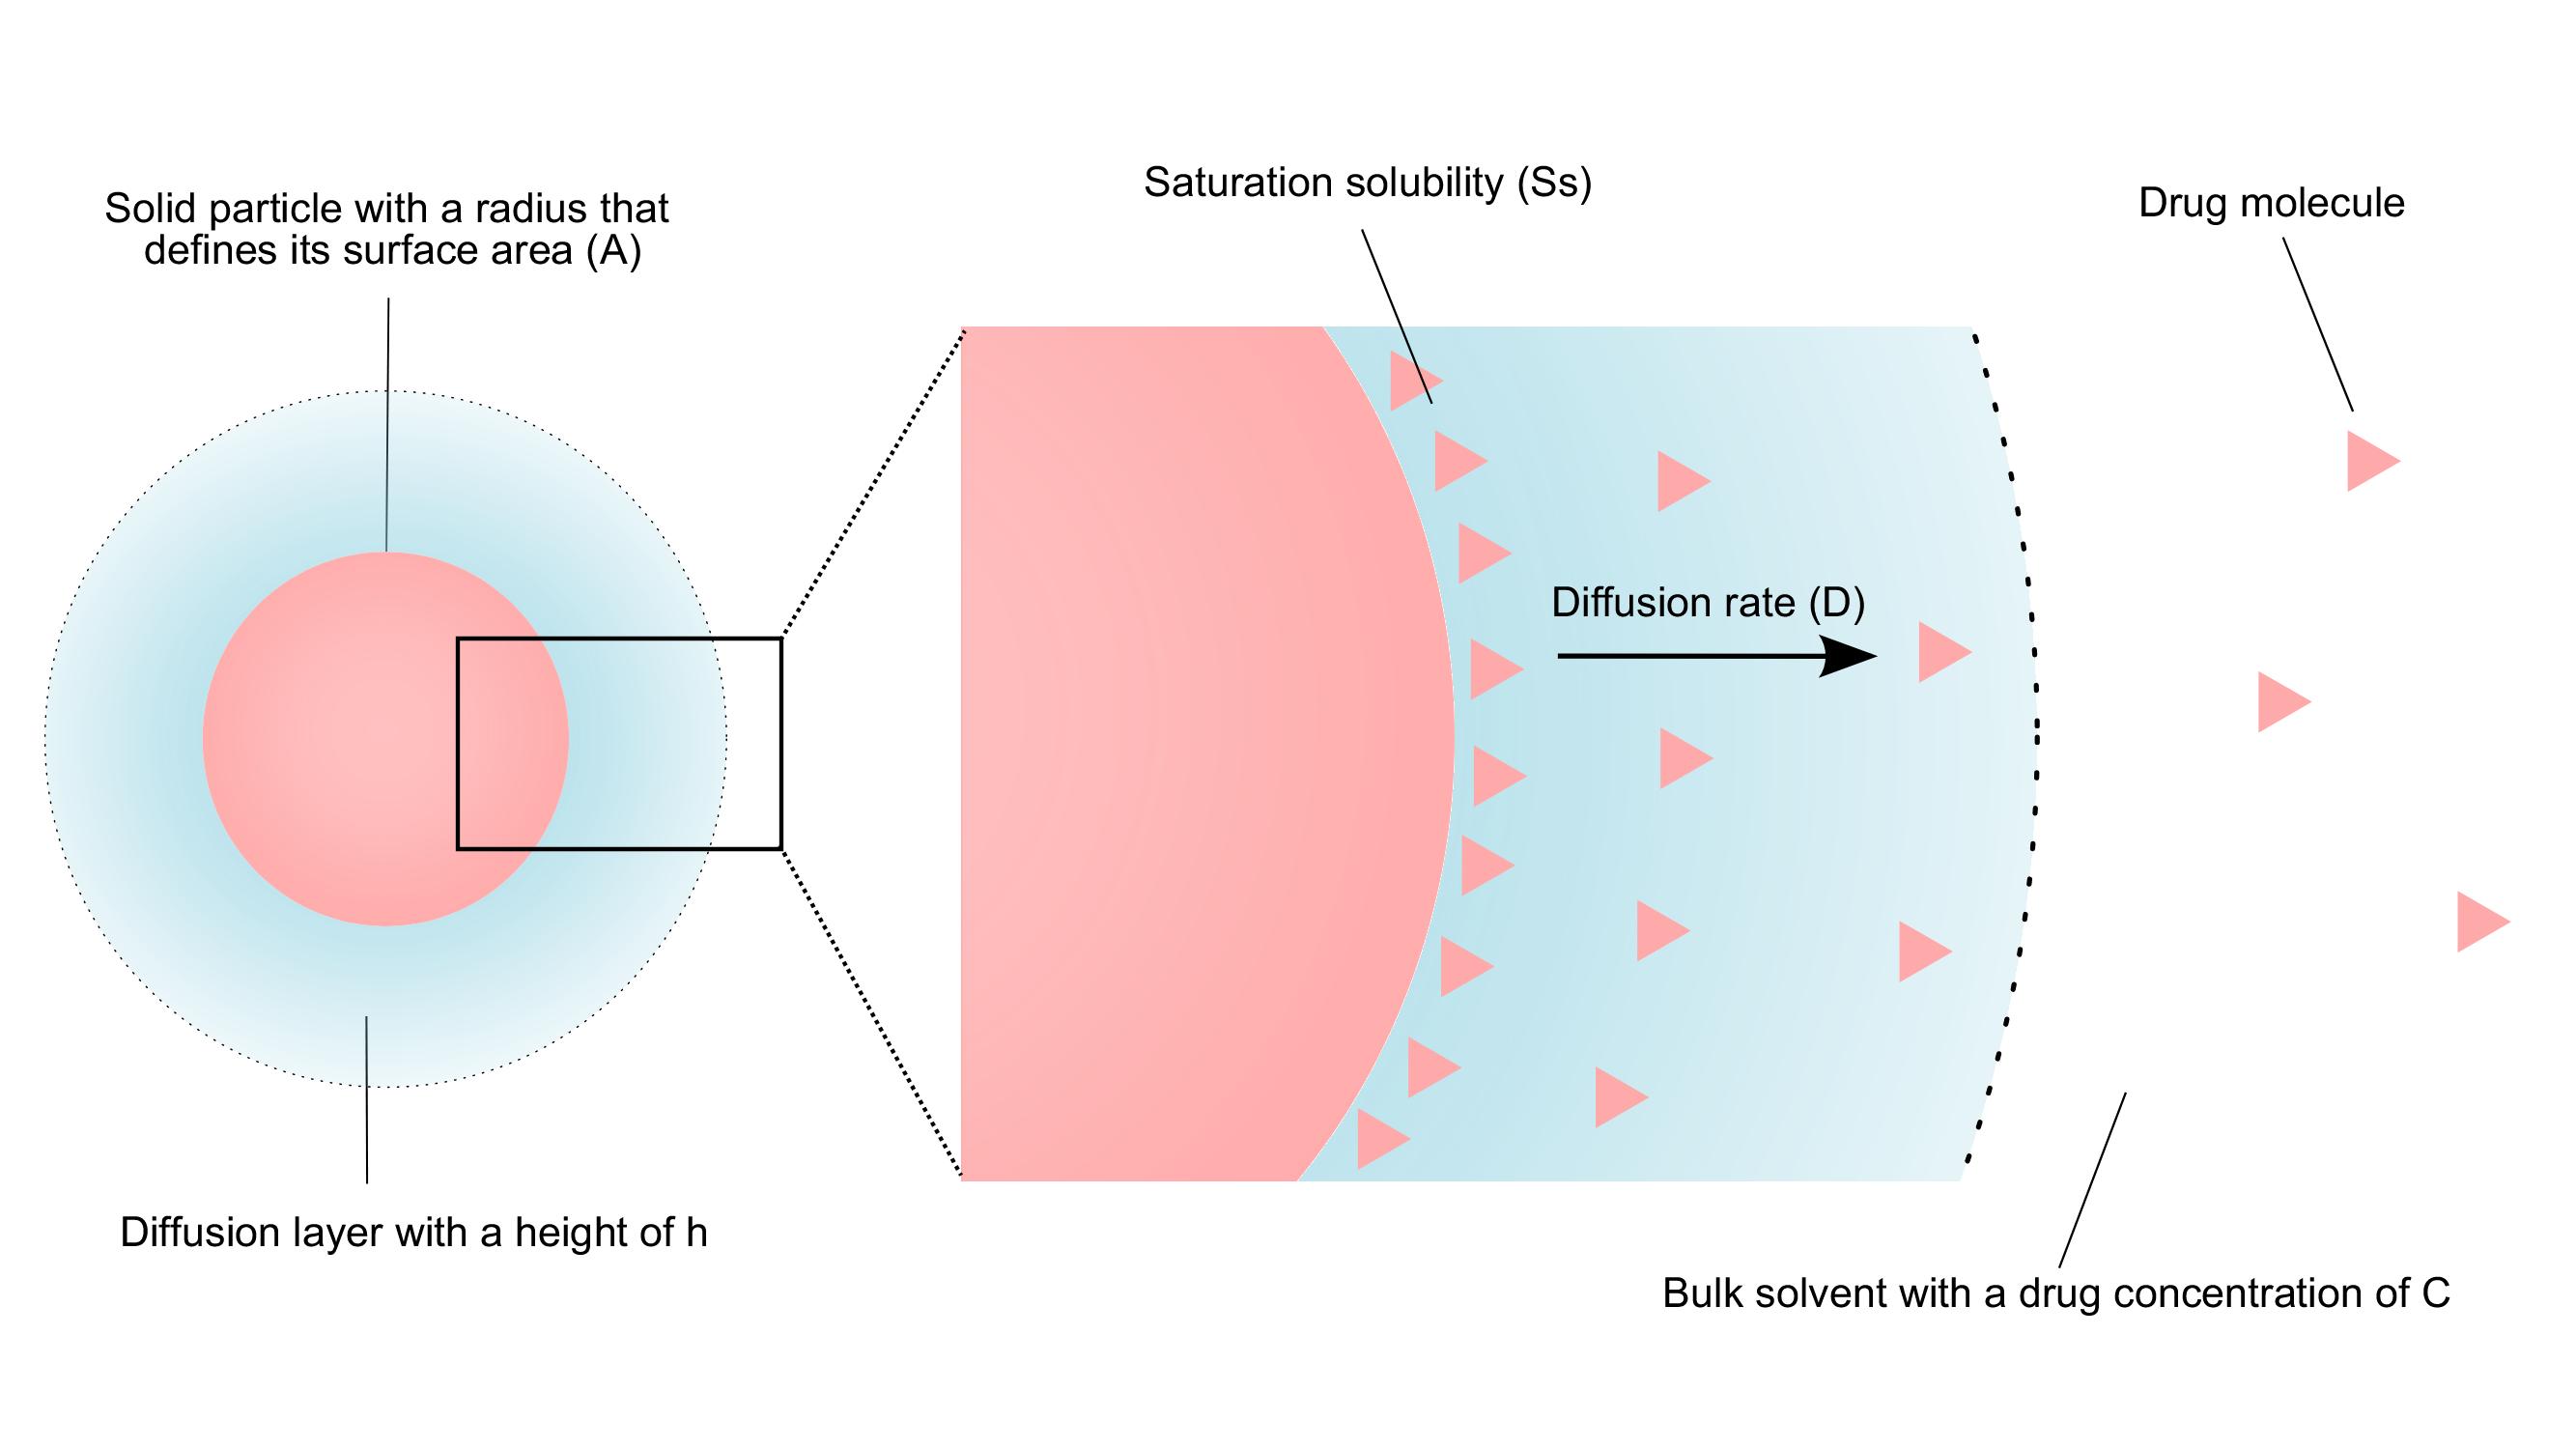 Intestinal absorption of BCS class II drugs